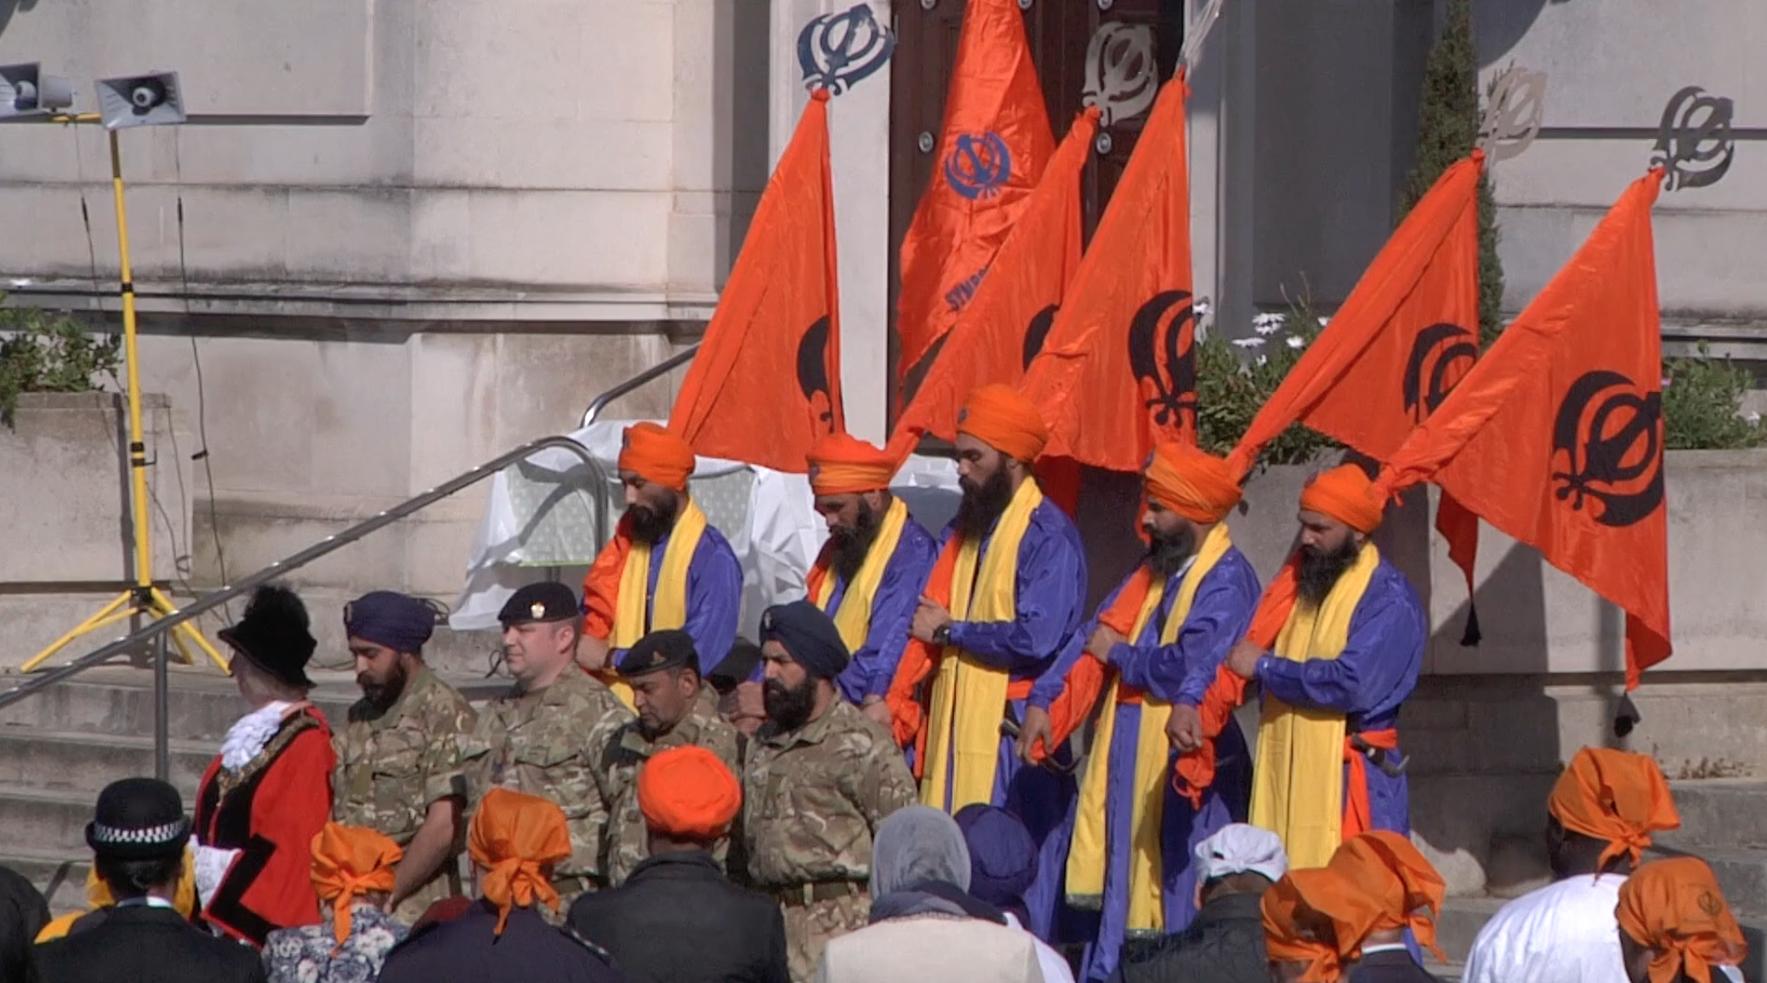 Thousands march through Southampton streets to mark Vaisakhi festival